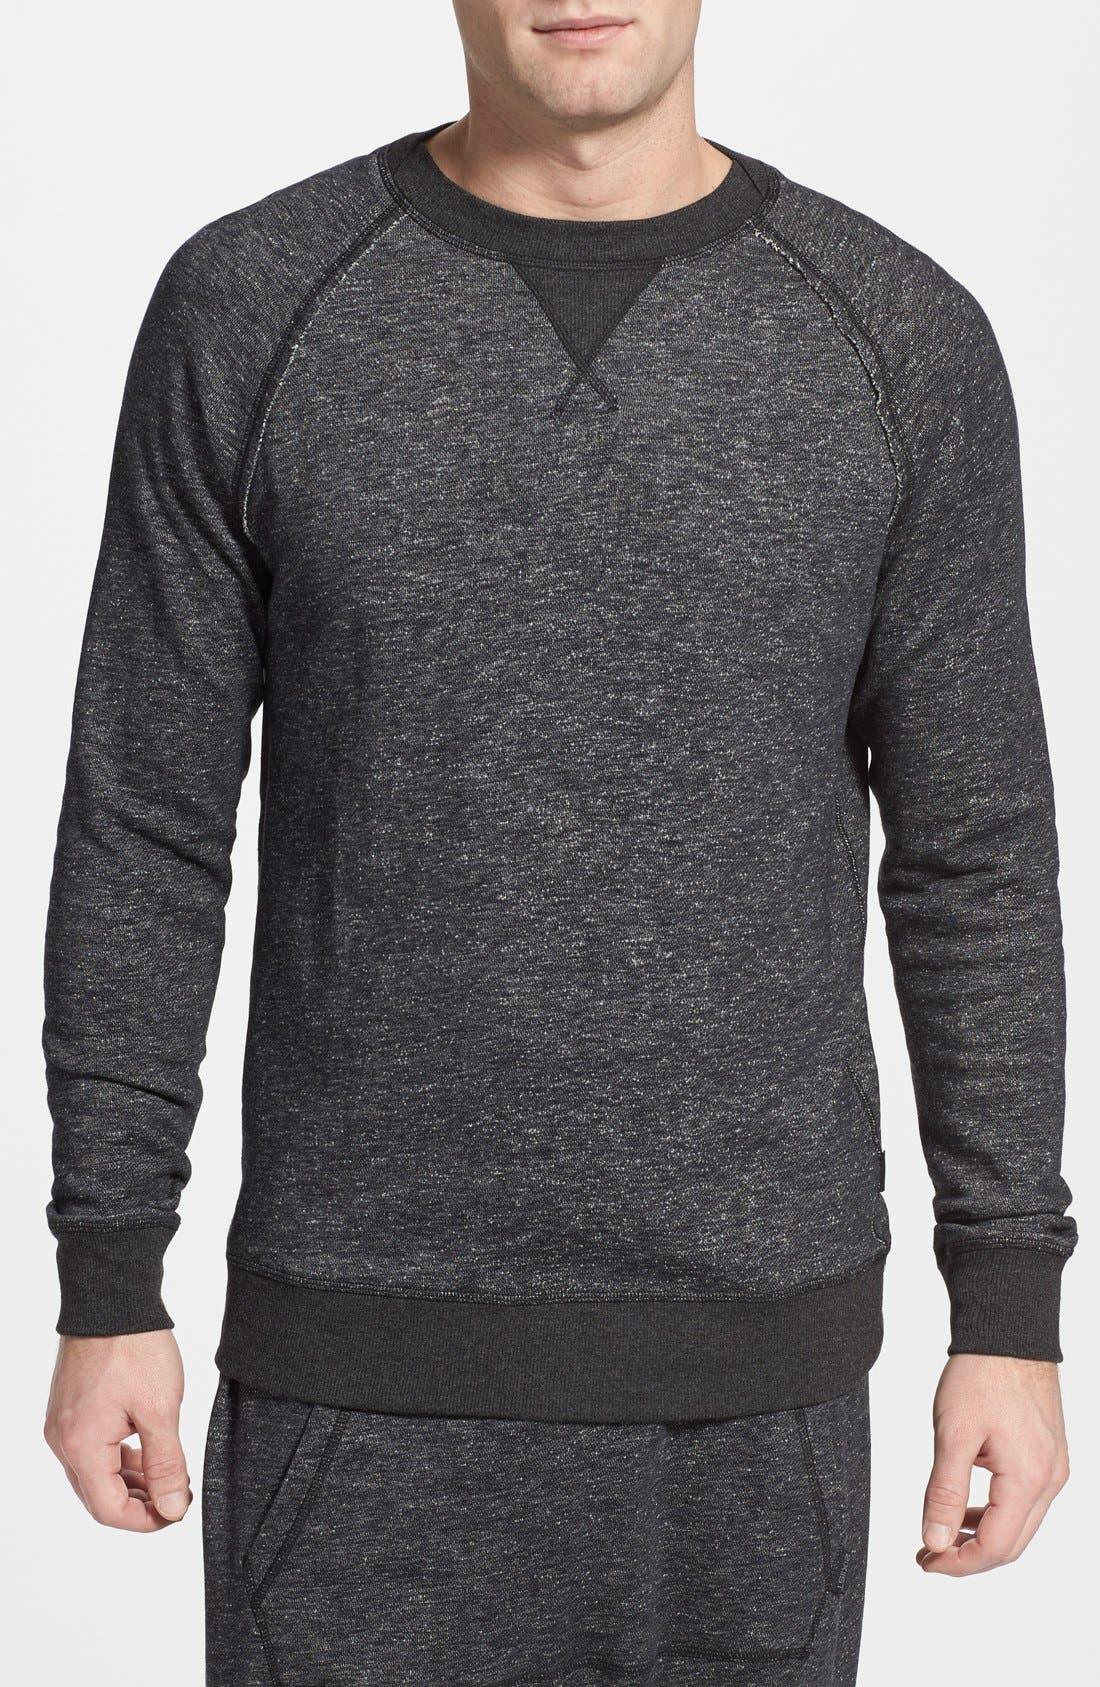 Terry Sweatshirt,                             Main thumbnail 1, color,                             Black Heather